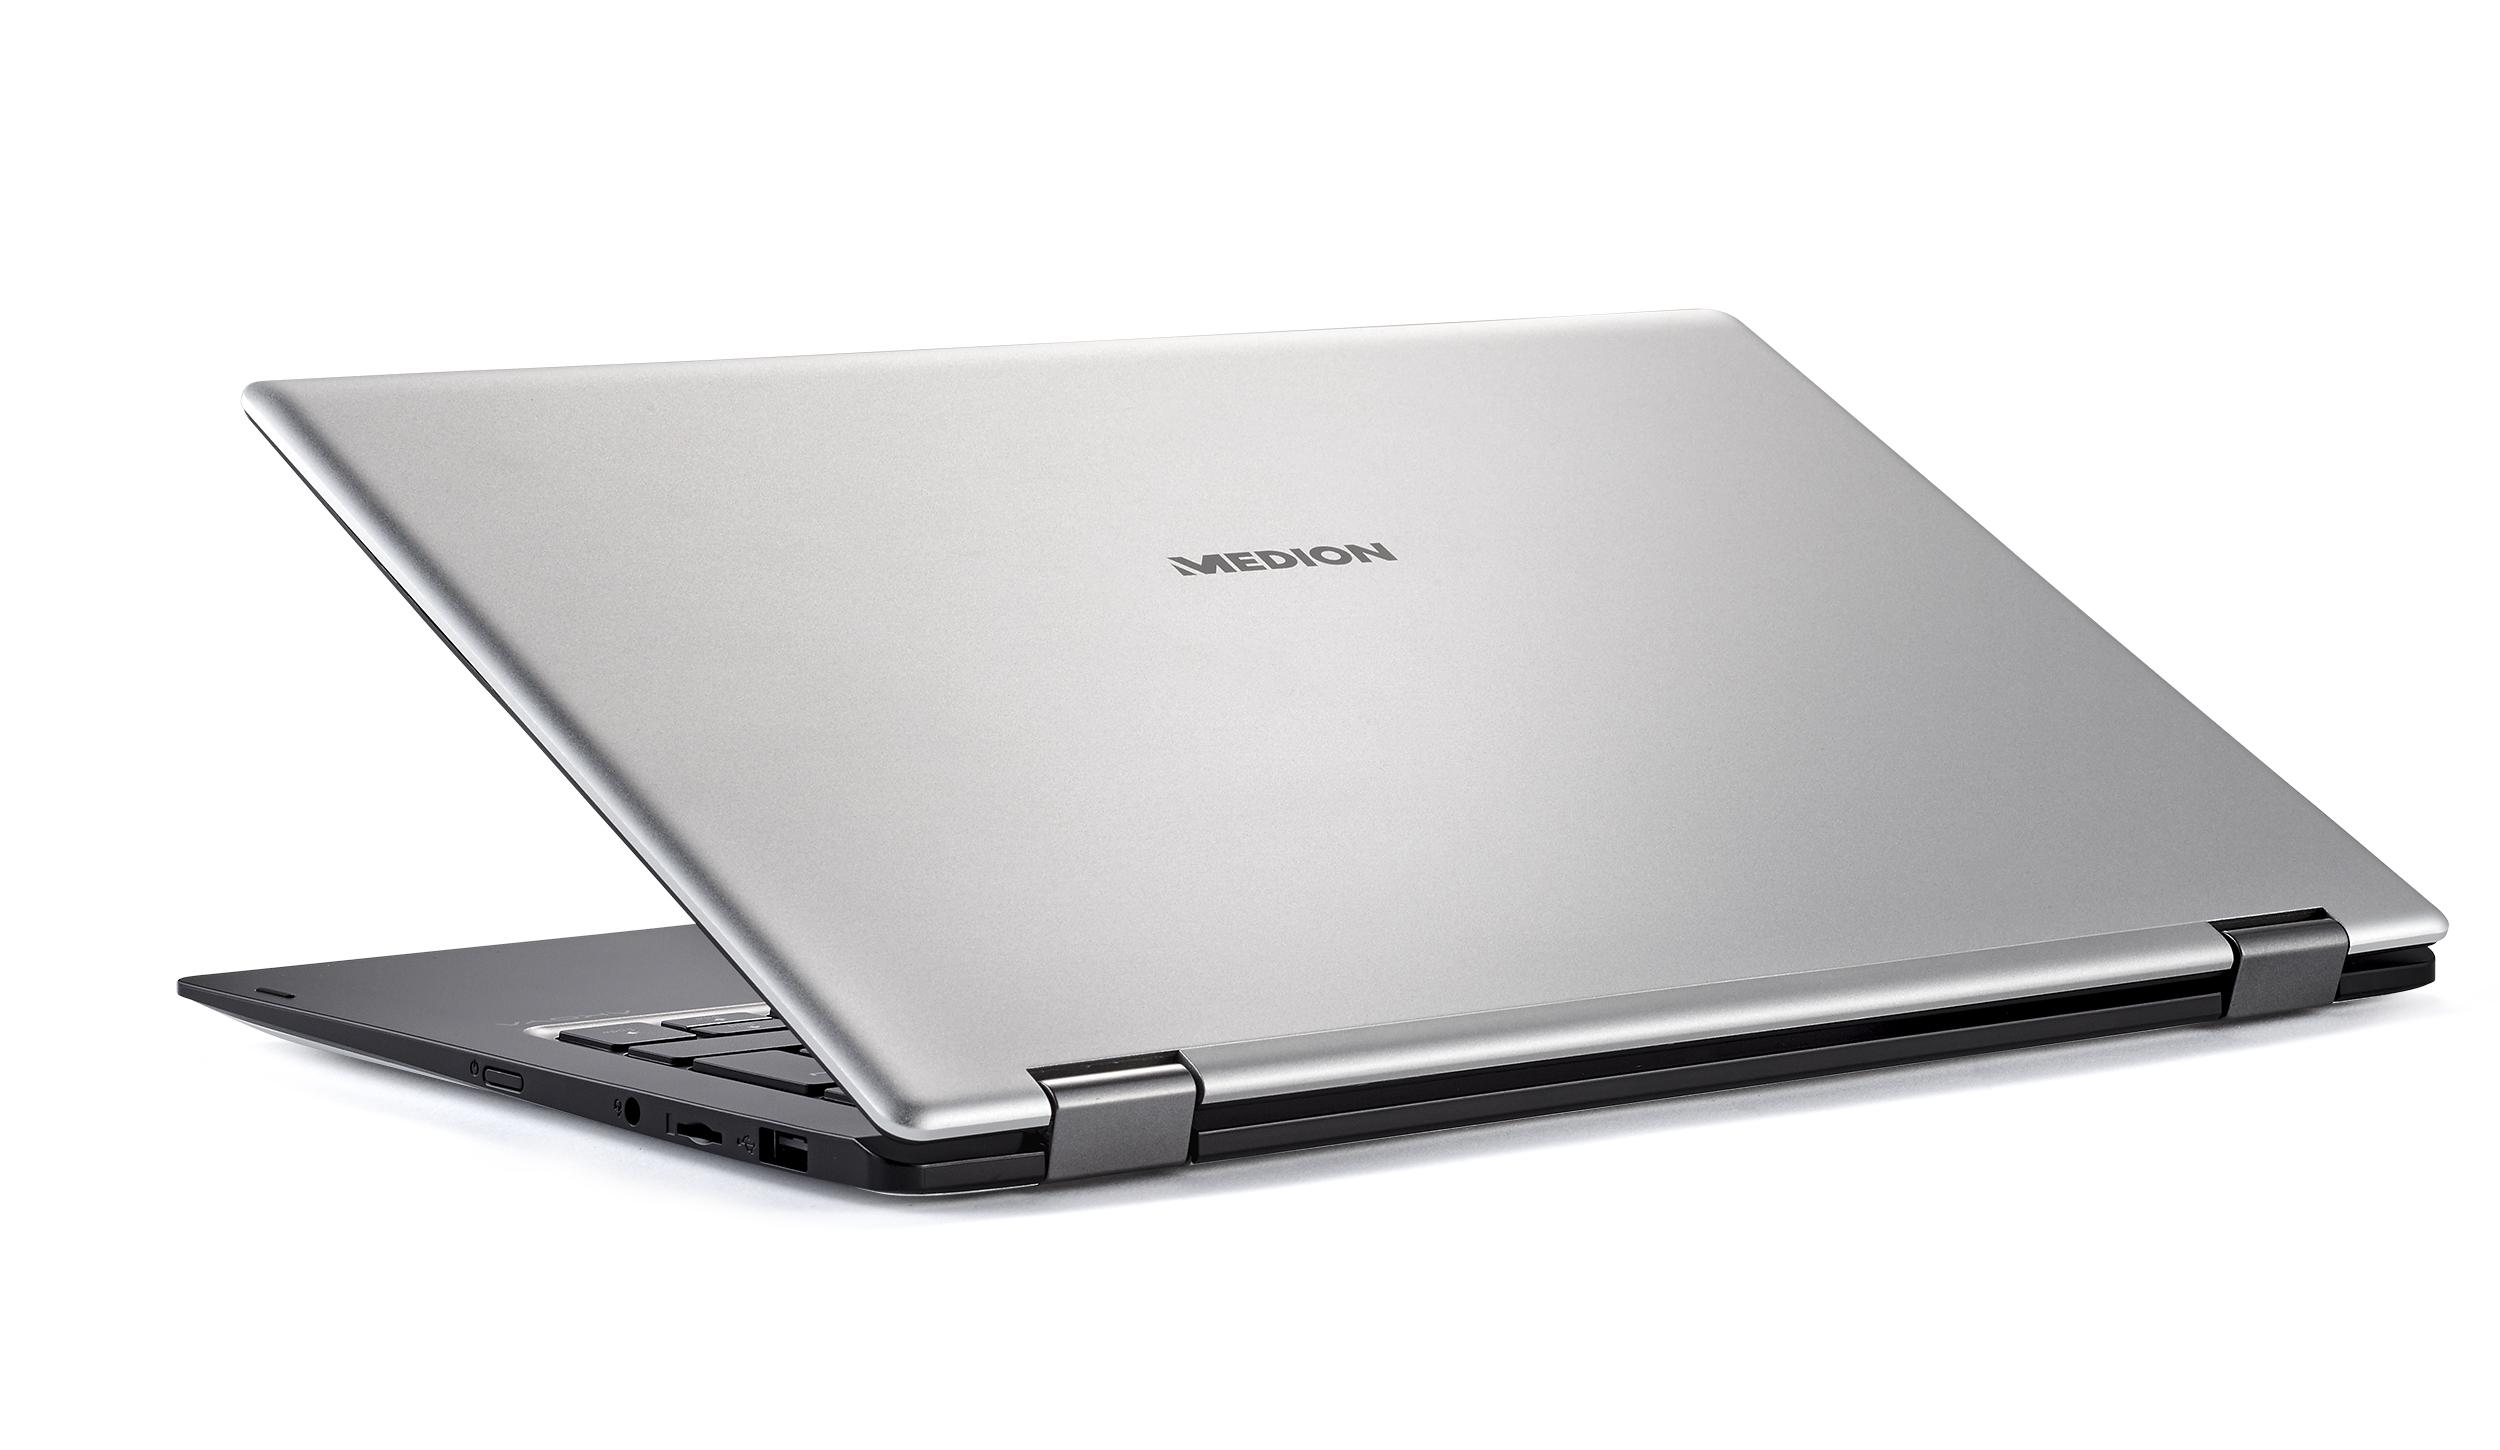 Laptop_Studio51_Medion